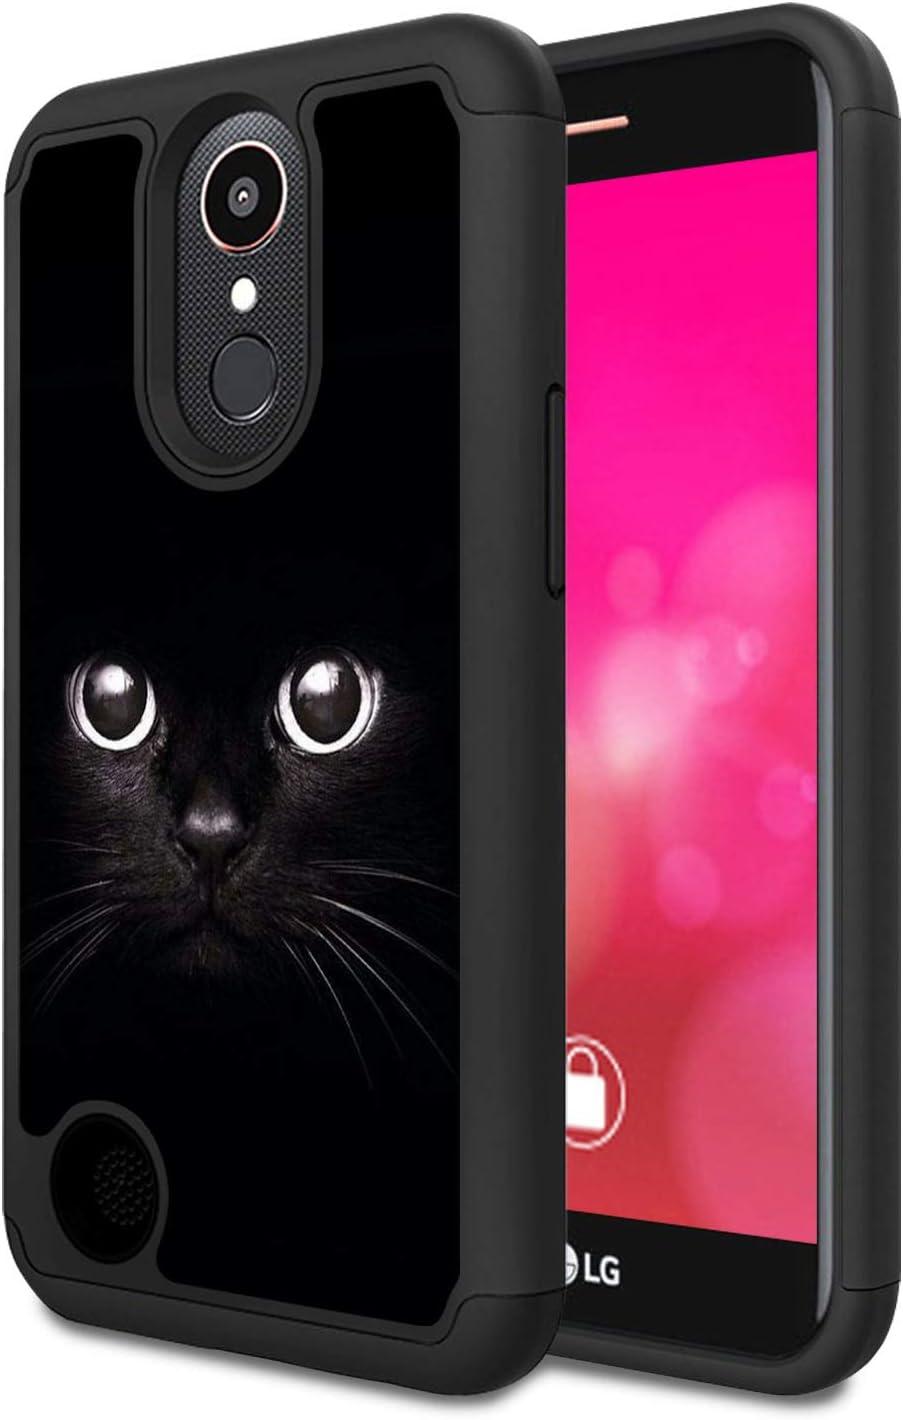 LG K20 V/K20 Plus/K10 2017/Harmony/V5 Case,Rossy Heavy Duty Hybrid TPU Plastic Dual Layer Armor Defender Protection Case Cover for LG K10 2017,Black Cat Face Eyes